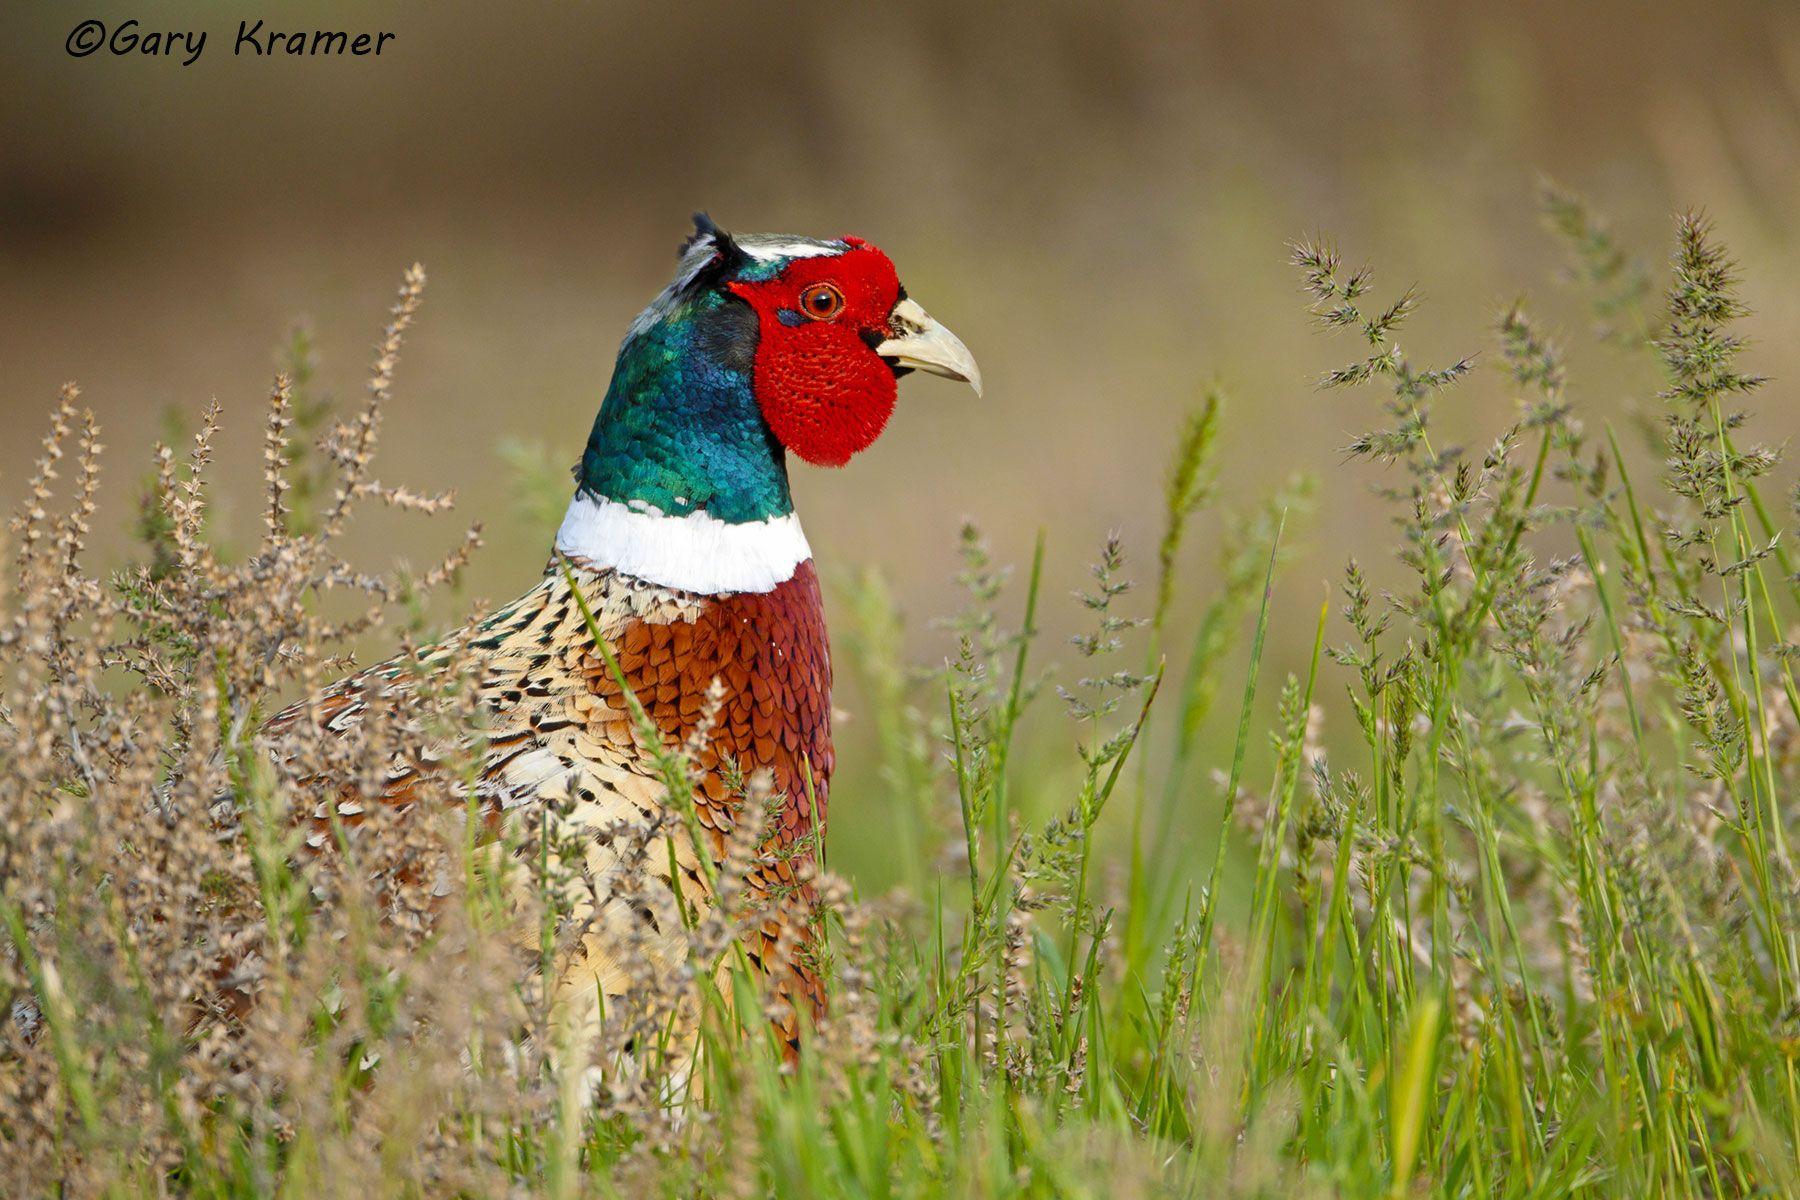 Ring-necked Pheasant (Phasianus colchicus) - NBGP#2278d